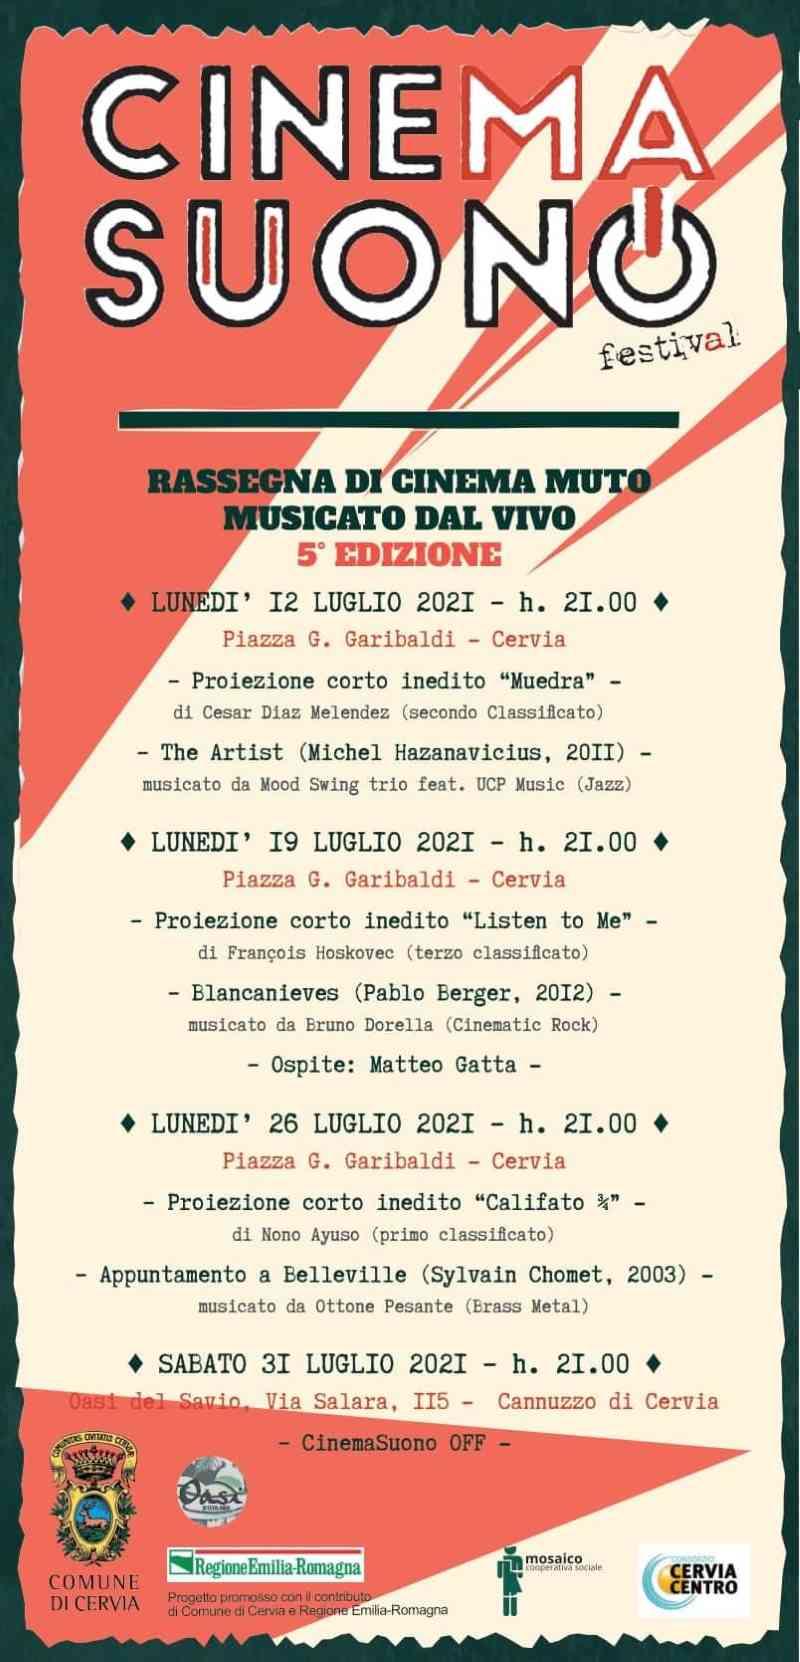 CinemaSuono a Cervia, locandina programma 2021